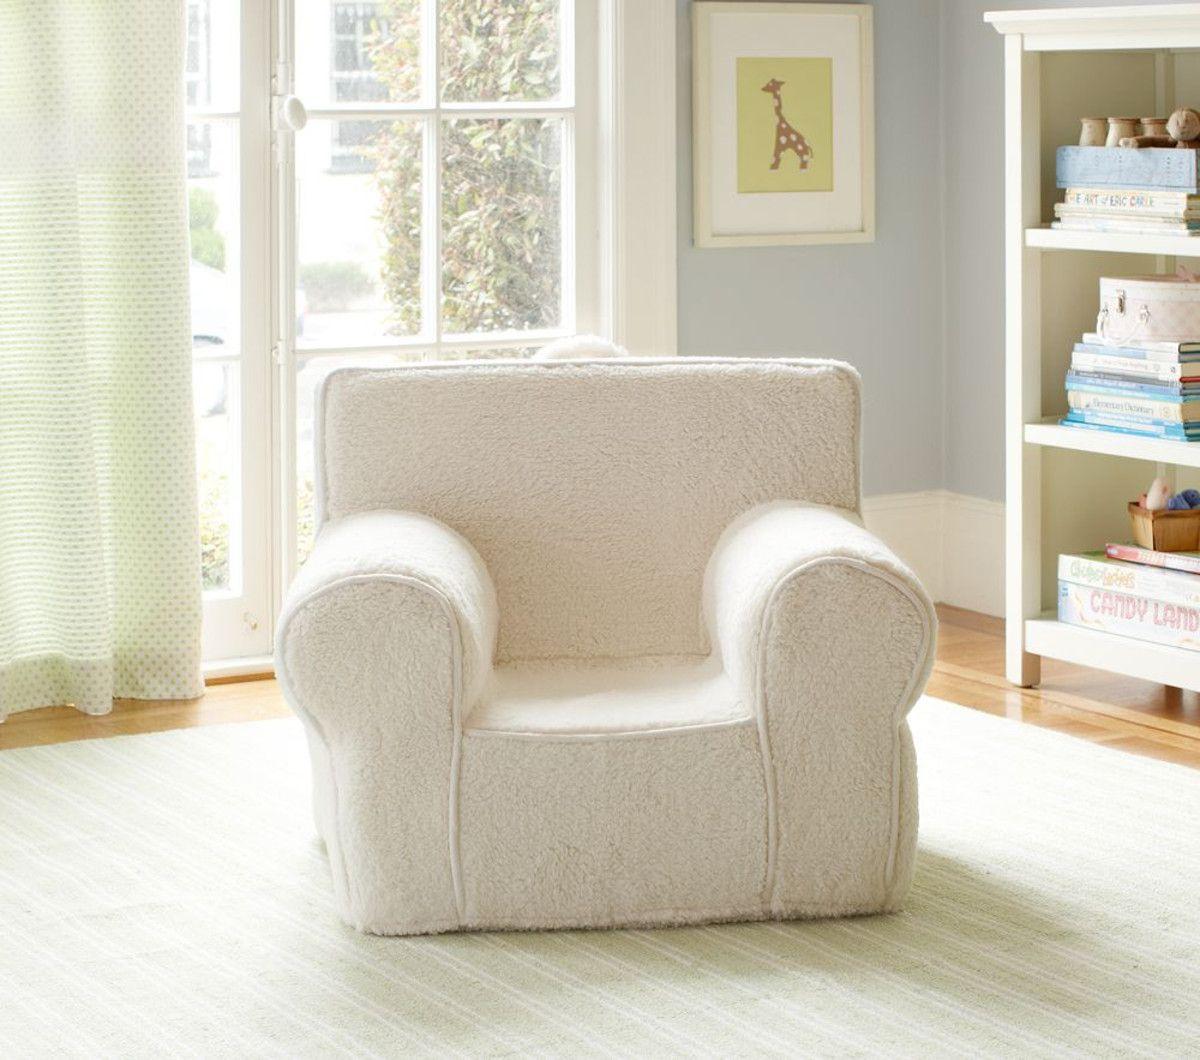 Cream Sherpa Anywhere Chair® Pottery barn anywhere chair